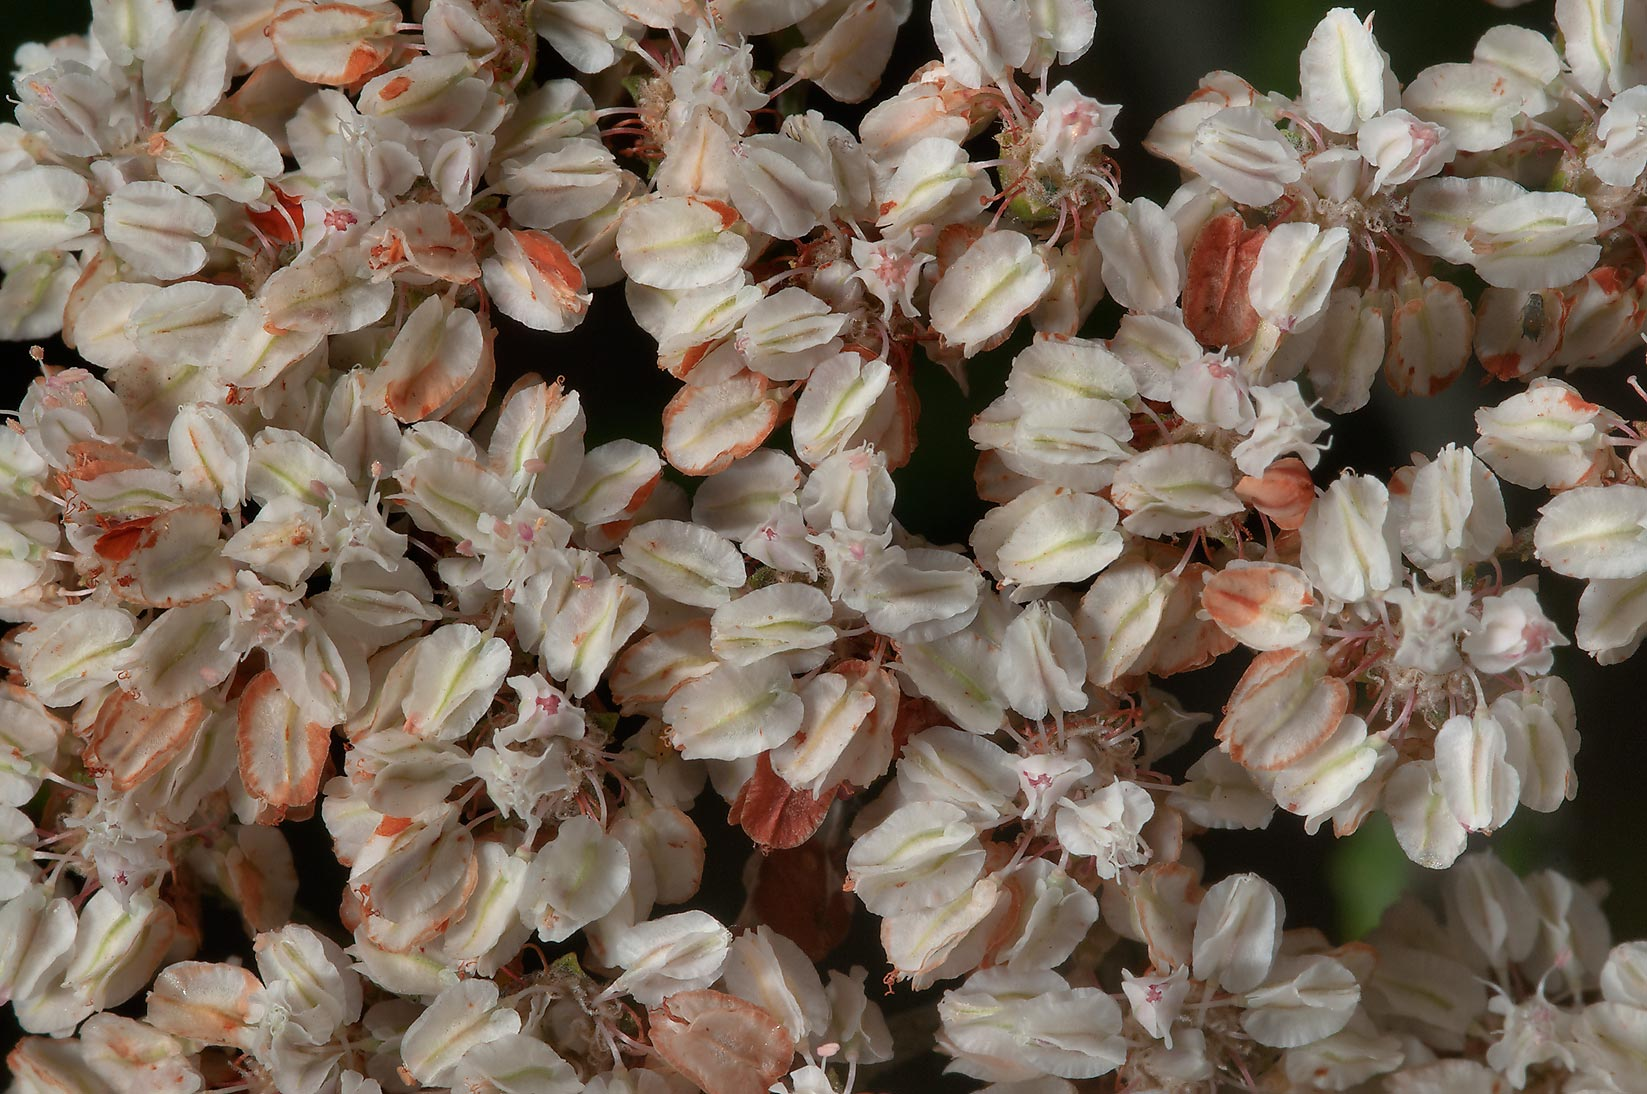 Photo 1118 01 Flowers Of Wild Buckwheat Yerba Coloradoof